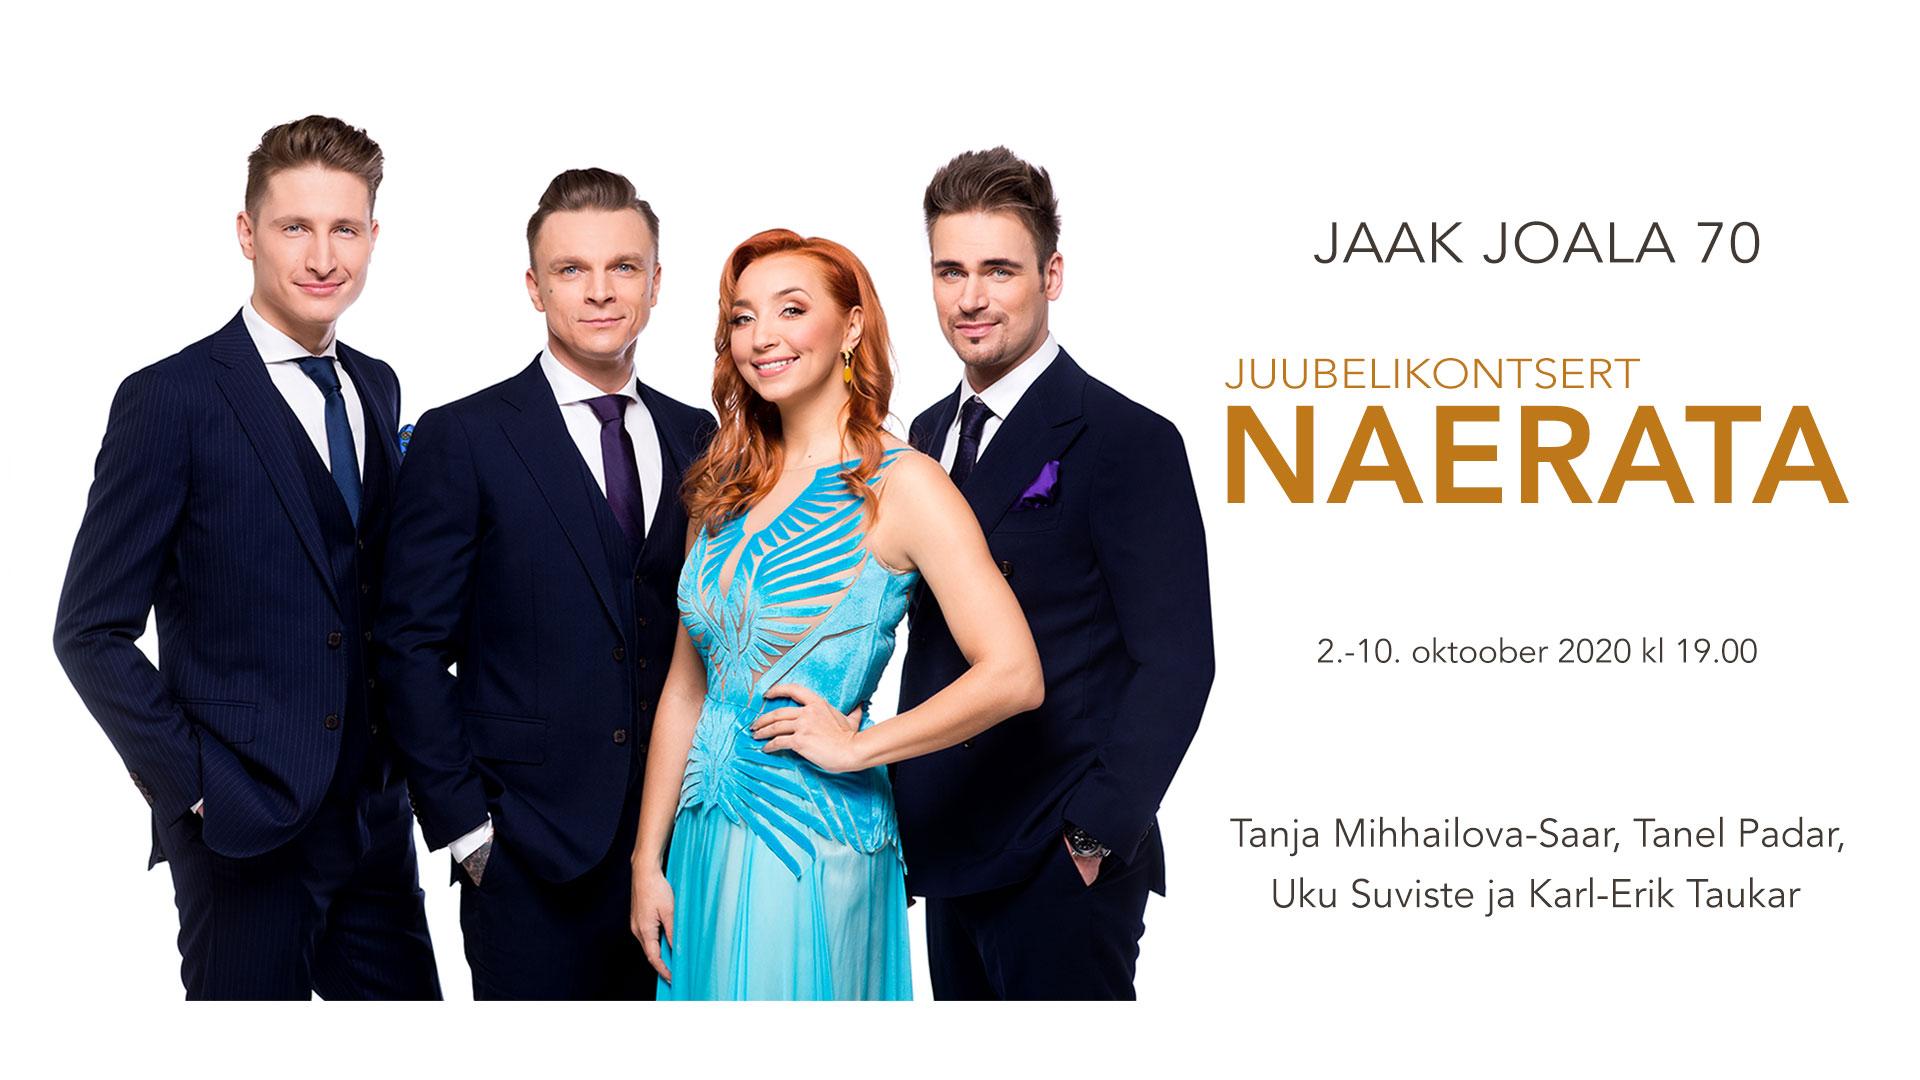 Jaak Joala 70 Juubelikontsert Naerata